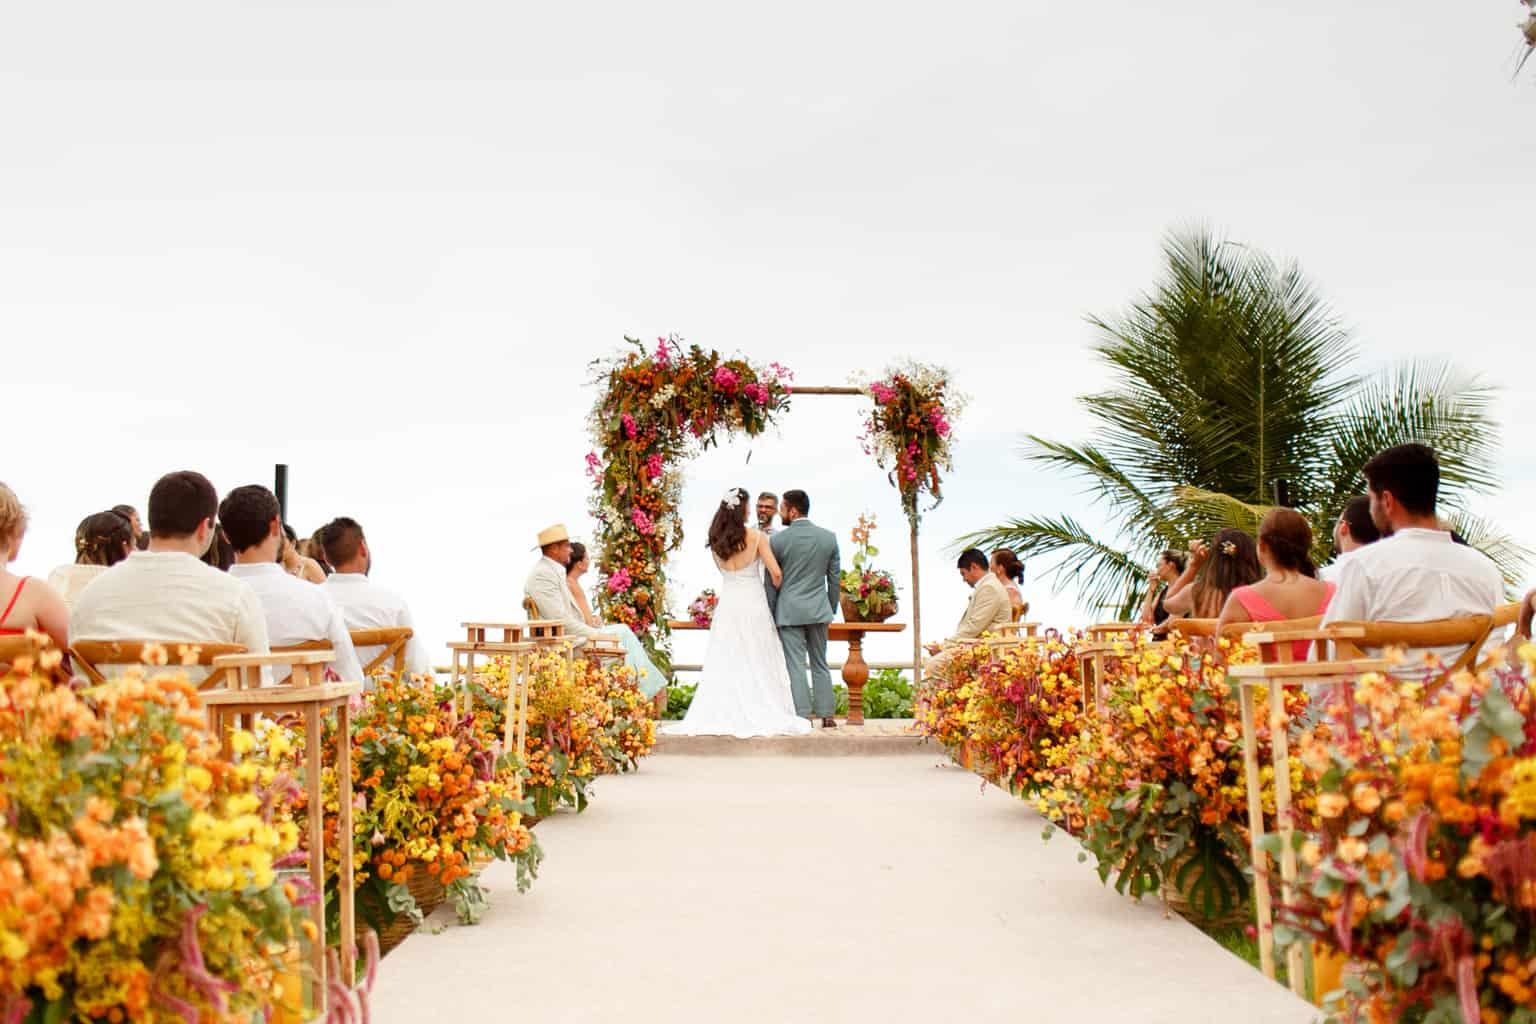 Casamento-Emanuelle-e-Alysson-Fotografia-Tadeu-Nanó-e-Luca-Antunes86